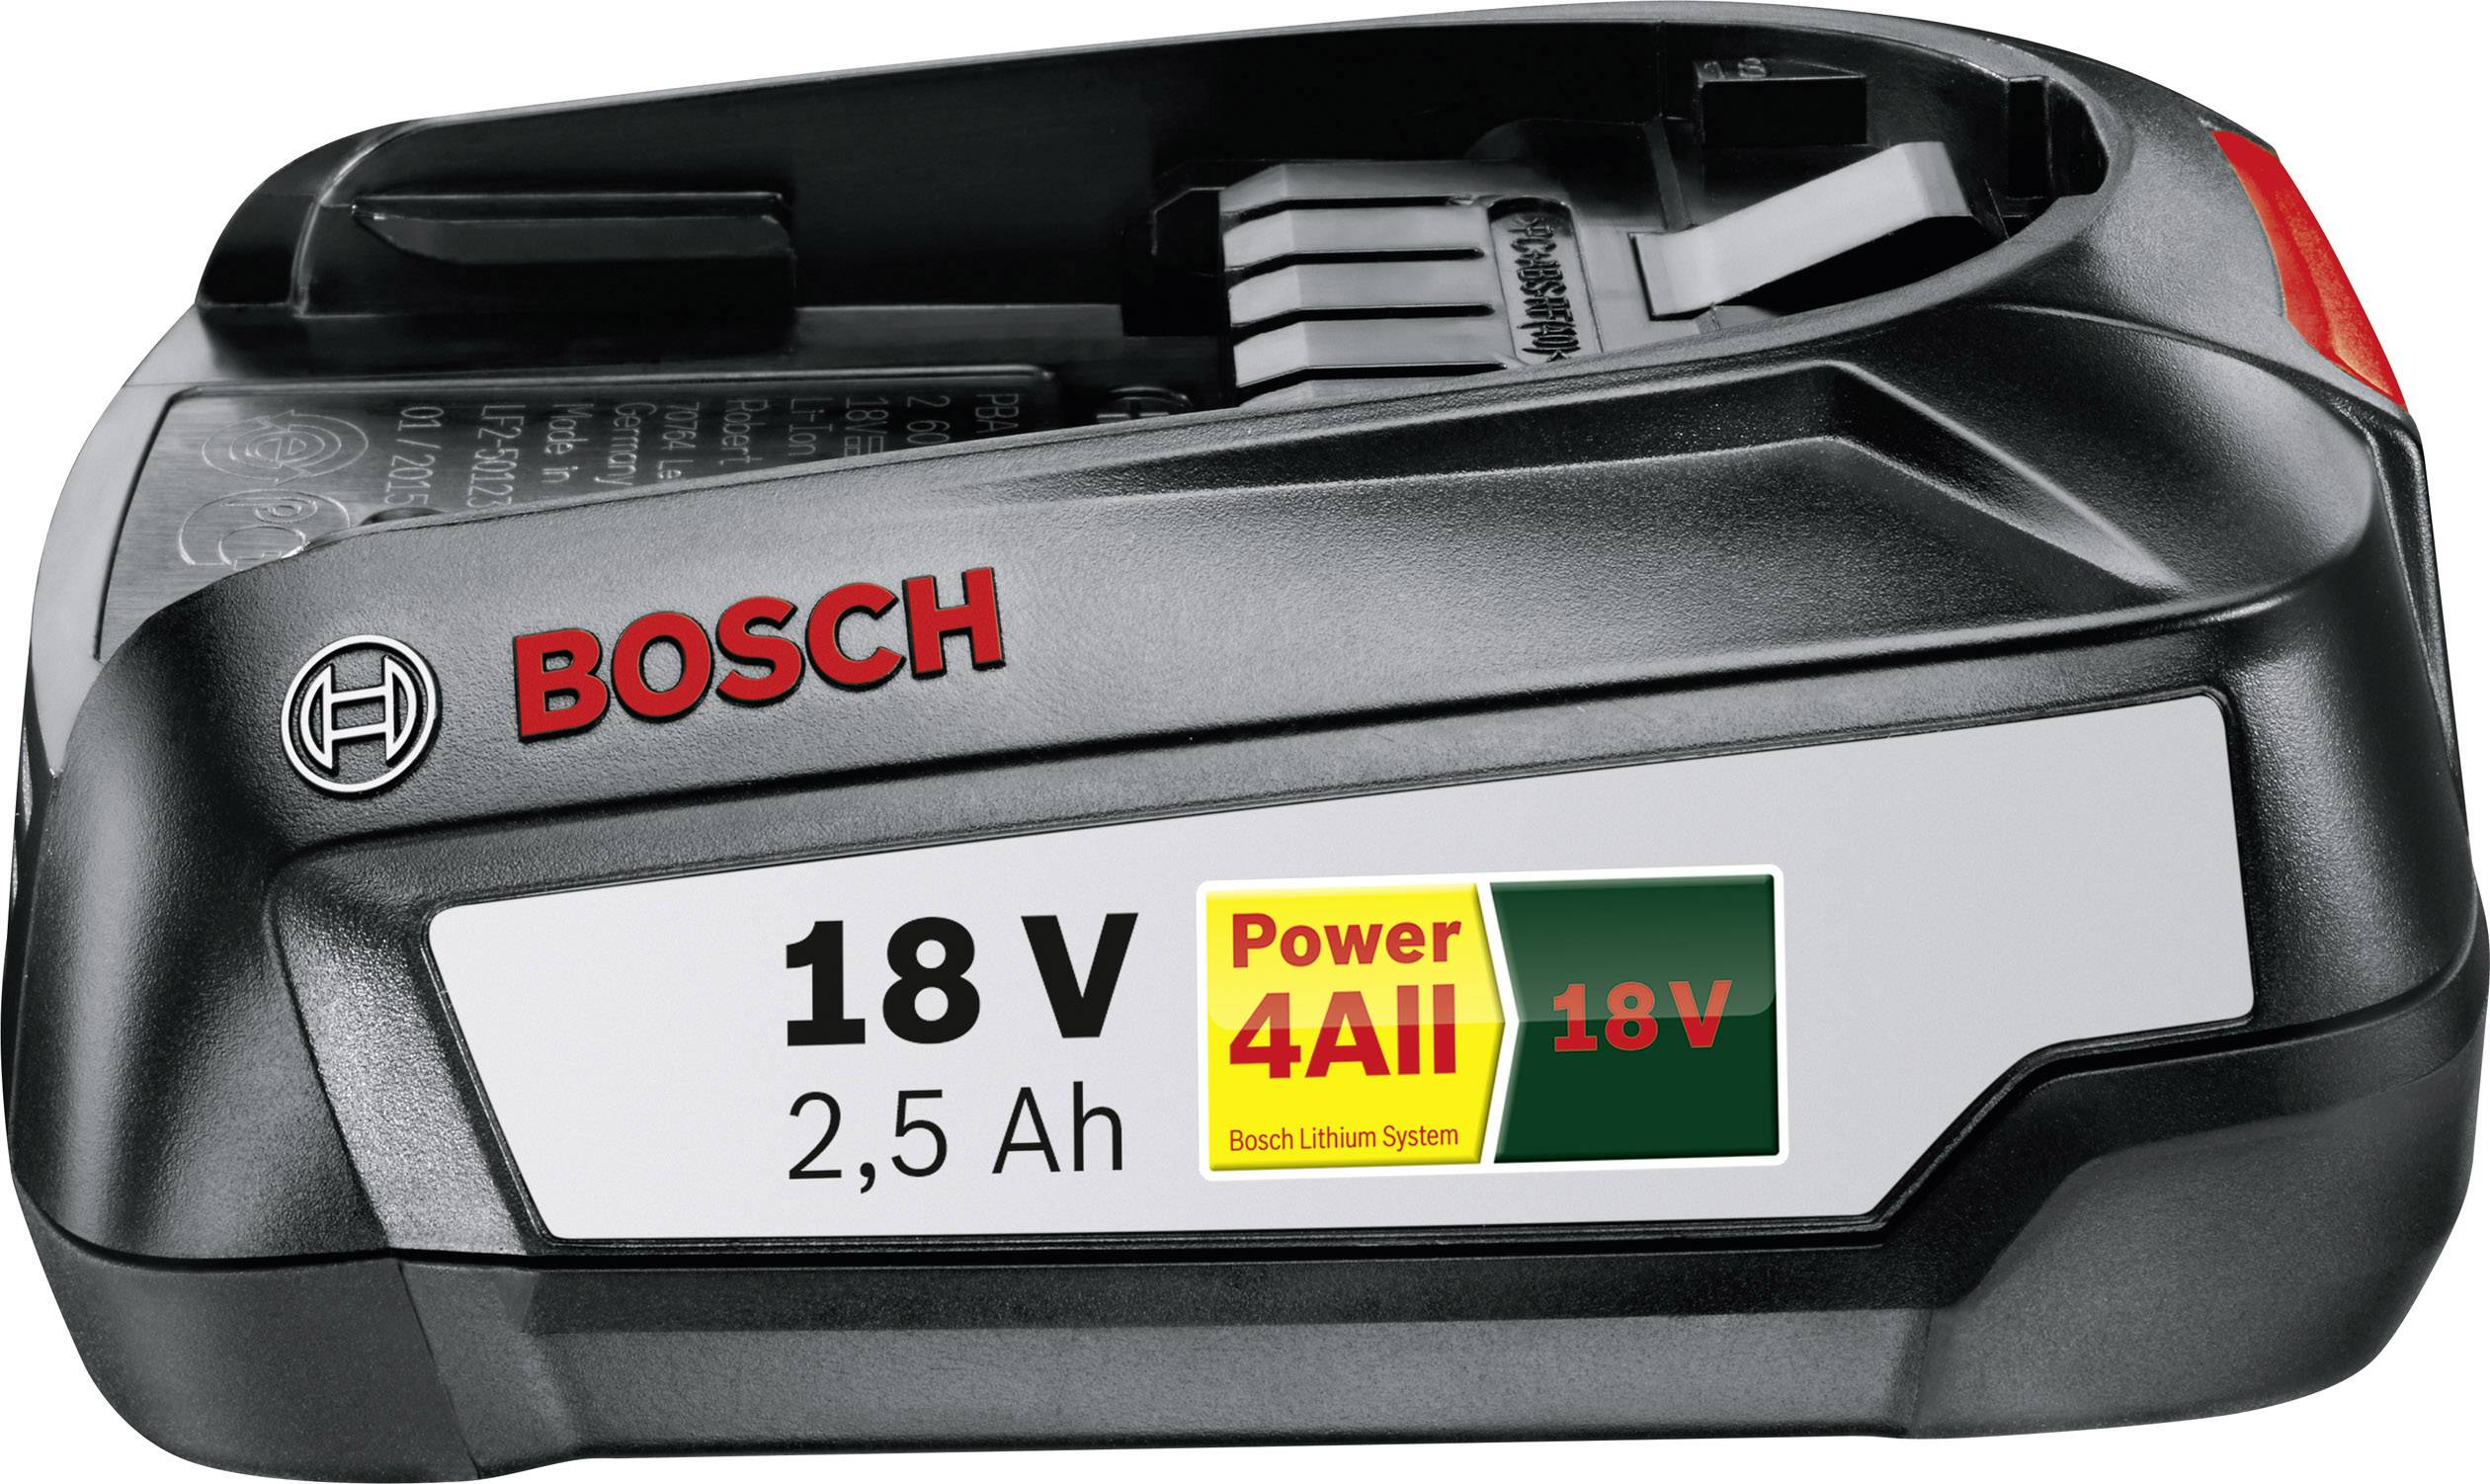 Bosch Home and Garden PBA 1600A005B0 Werkzeug Akku 18 V 2.5 Ah Li Ion